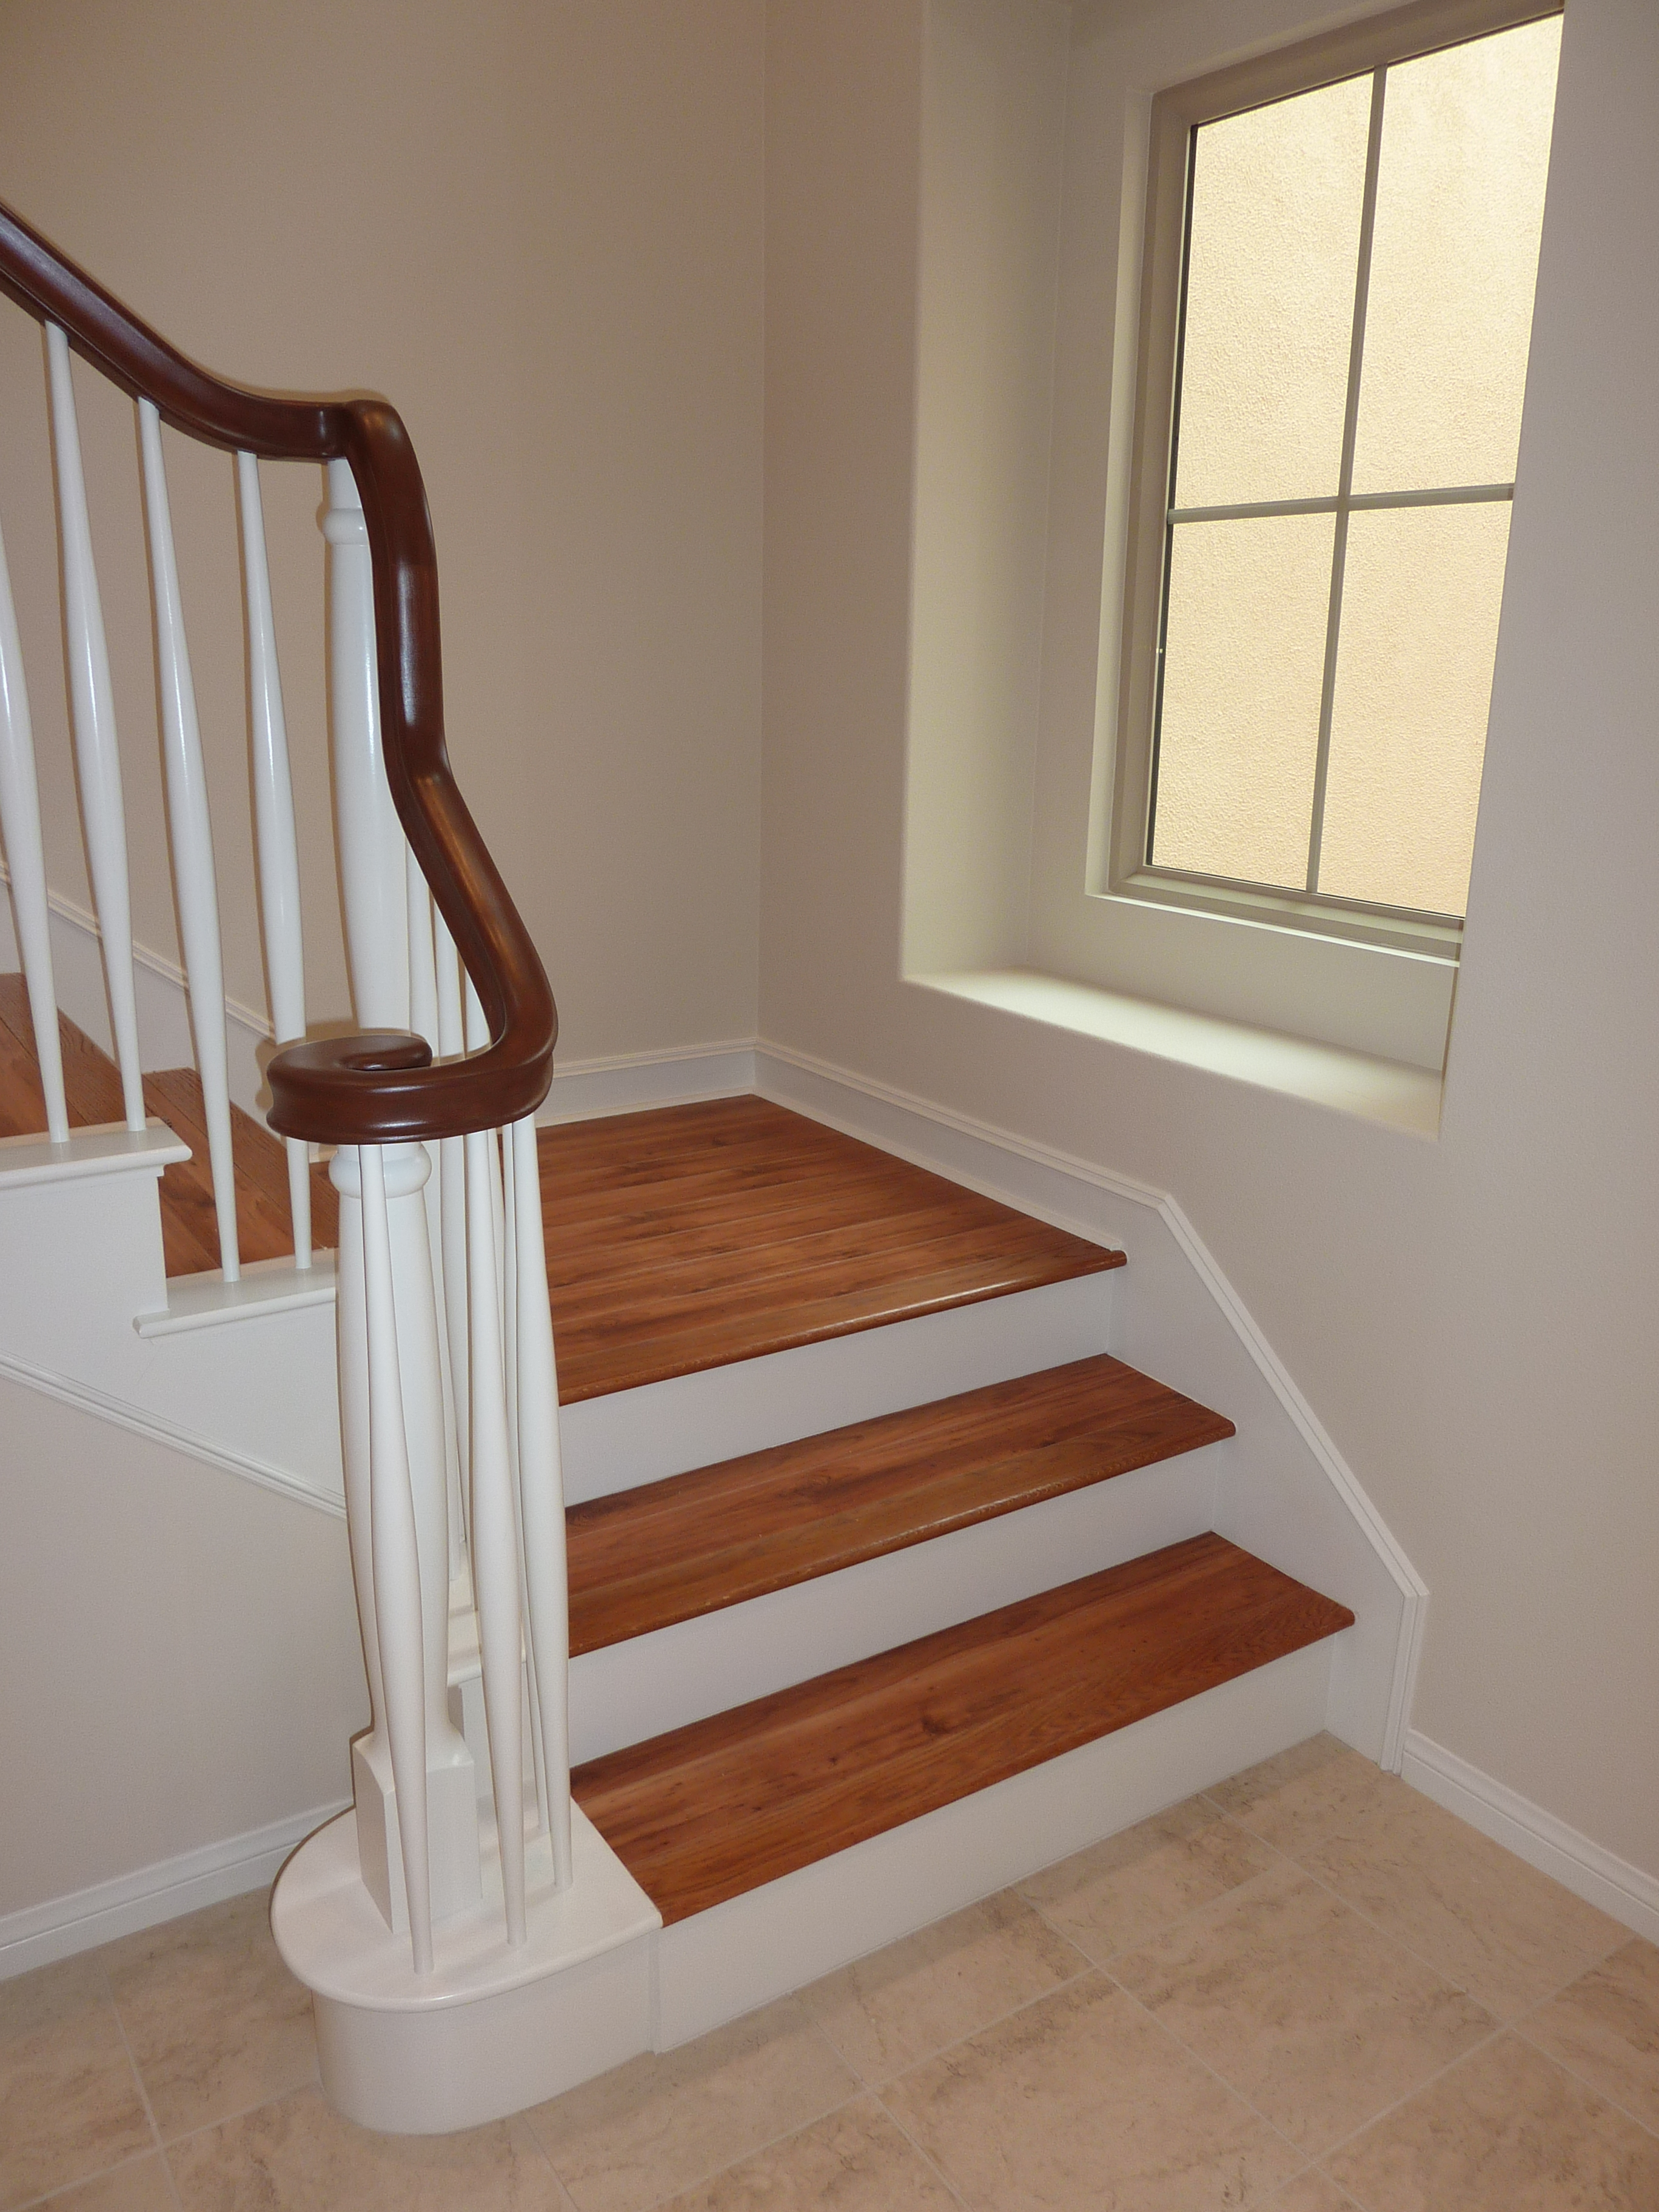 Laminate Flooring: Put Laminate Flooring On Stairs